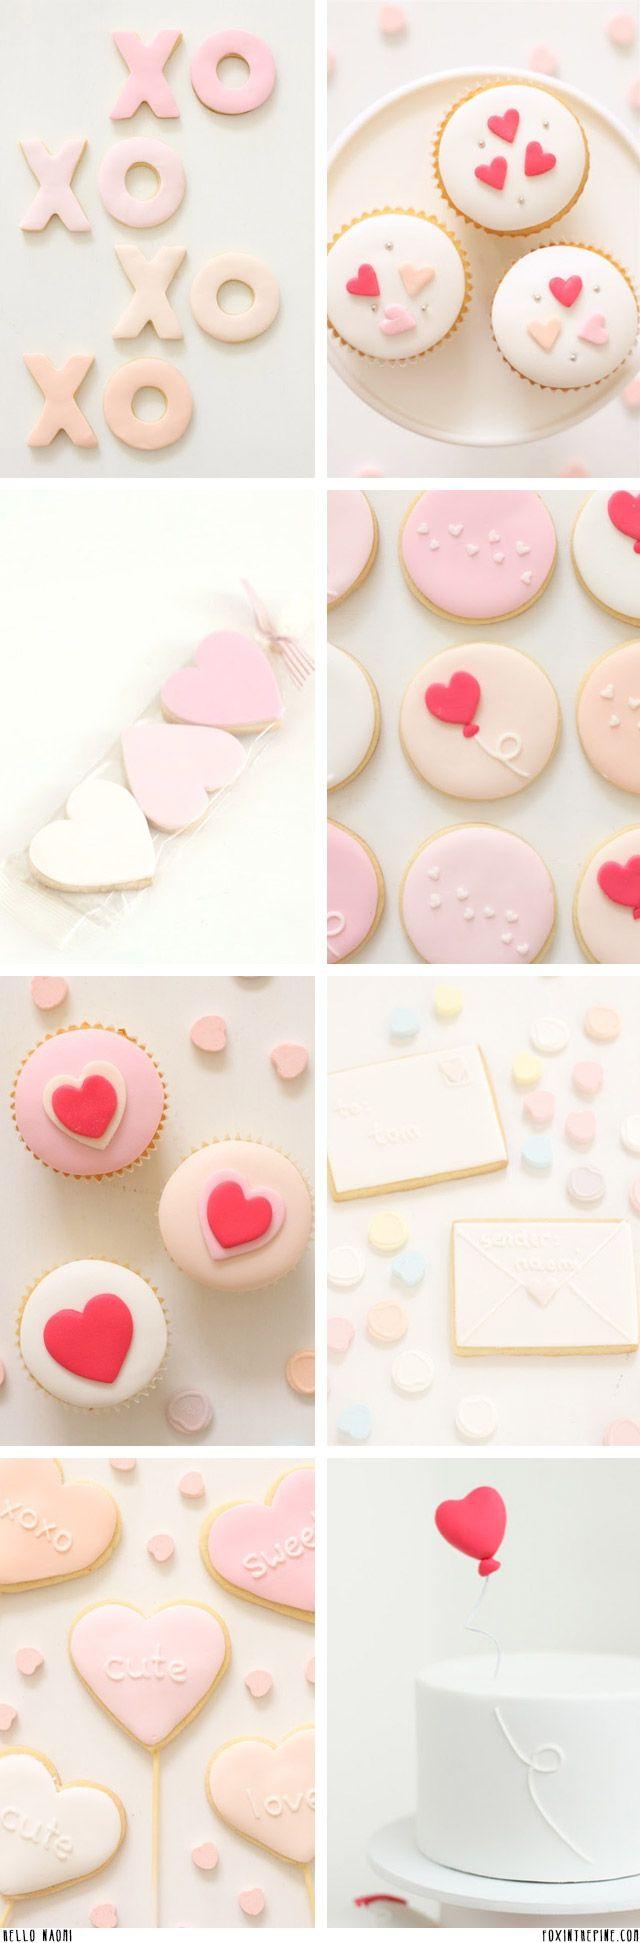 Sweet Valentine treats from Hello Naomi   //   FOXINTHEPINE.COM